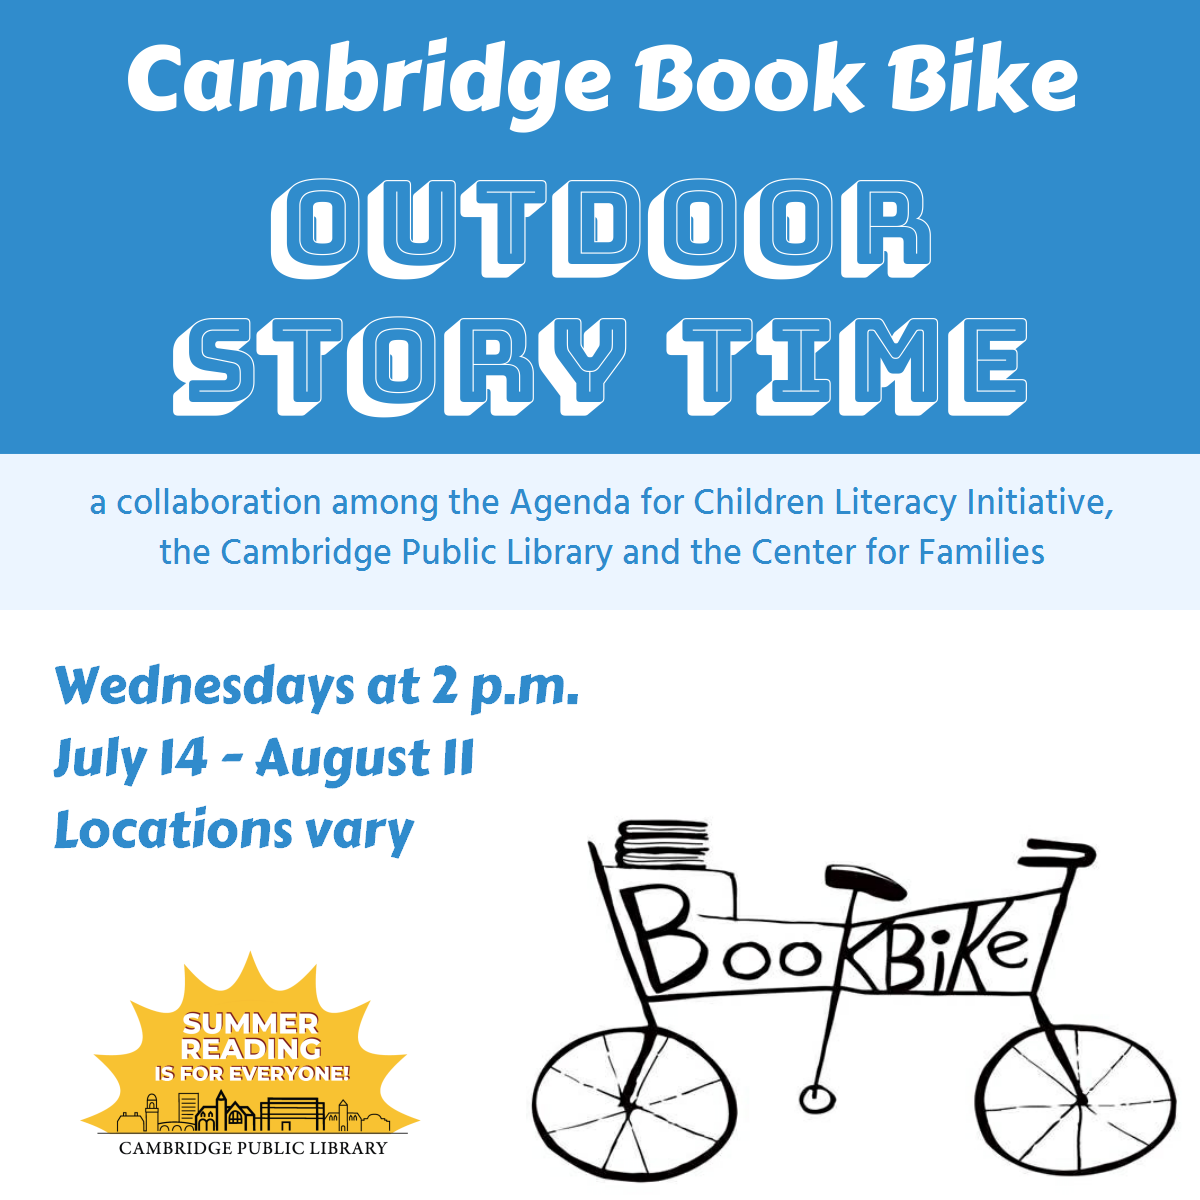 Cambridge Book Bike Story Time (O'Neill)